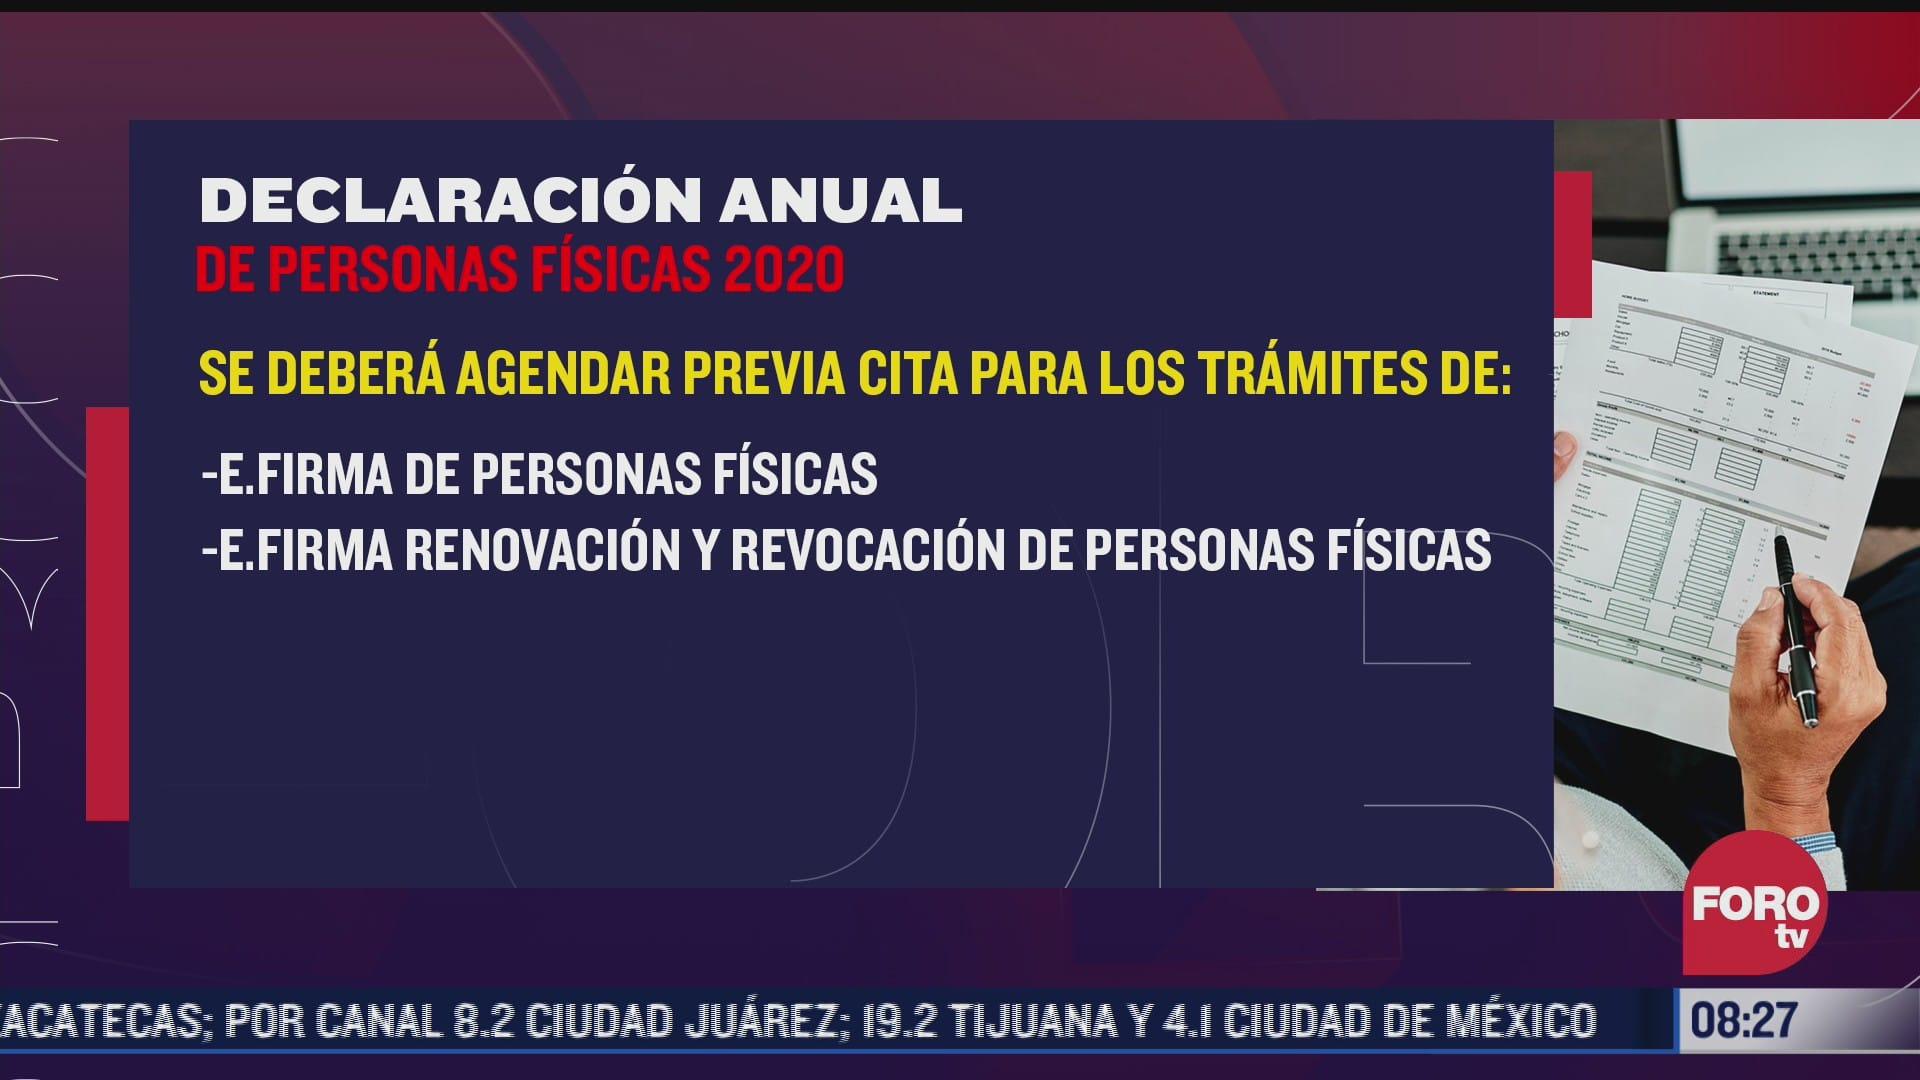 sat 31 de mayo vence plazo de ampliacion para presentar declaracion anual